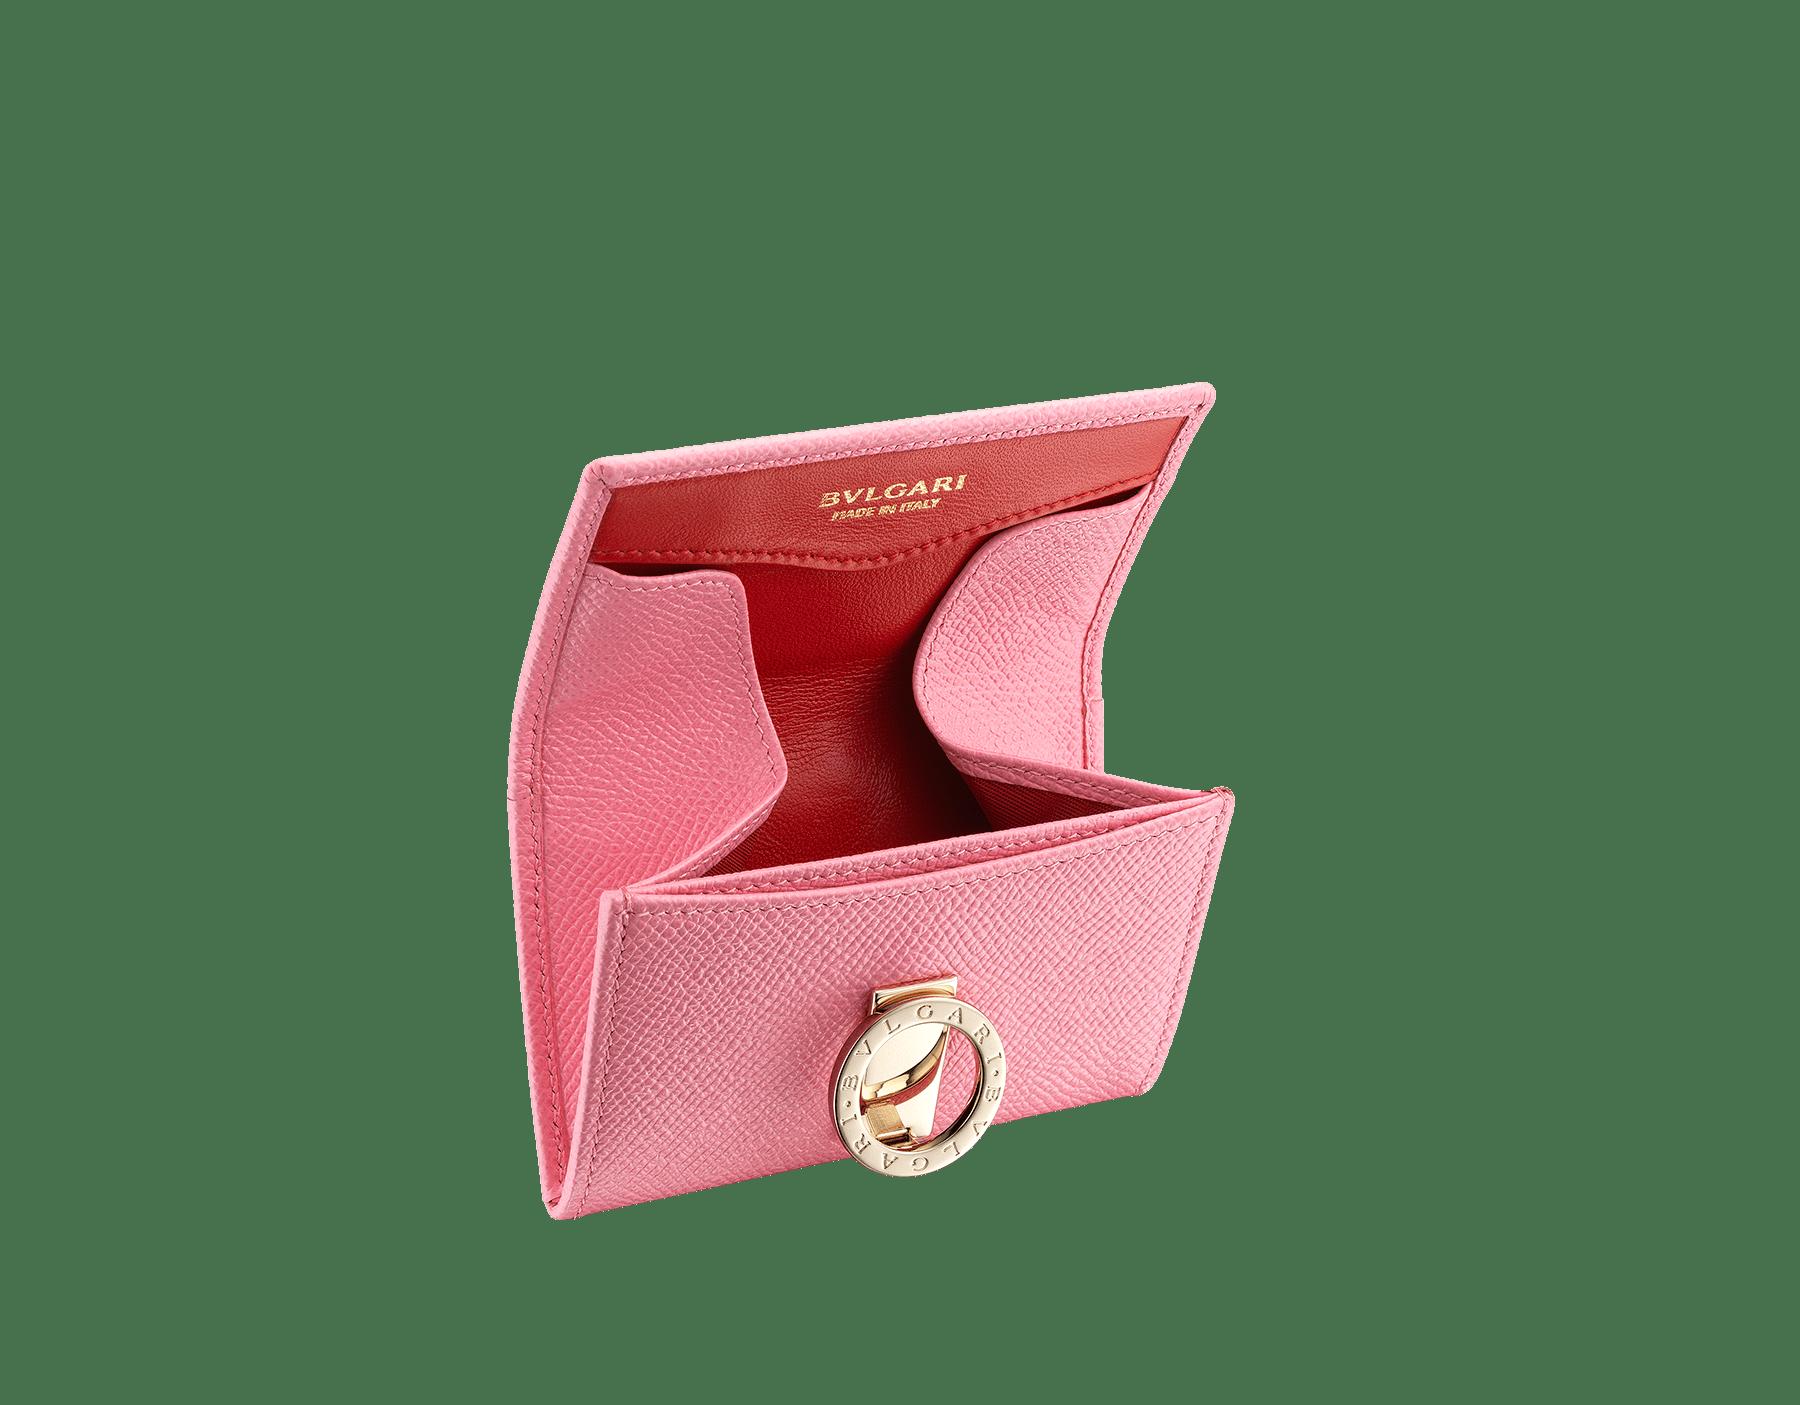 BVLGARI BVLGARI 糖果石英色亮珠面小牛皮和洋紅碧玉色 Nappa 軟面皮零錢包,寶格麗經典標誌淡金色黃銅扣環。 287496 image 2